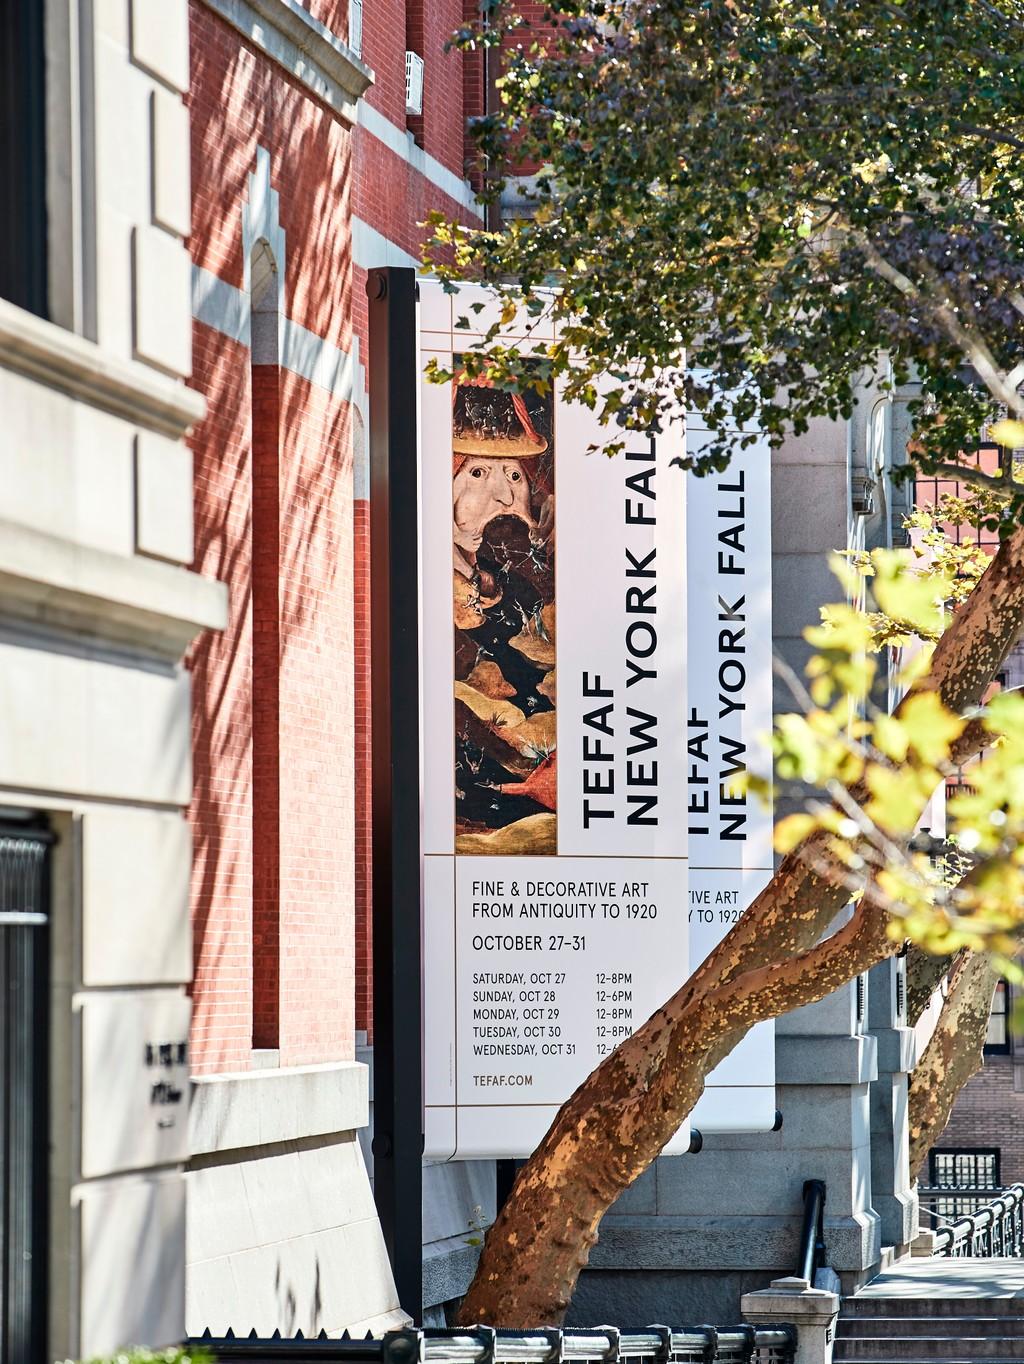 New York city art fair